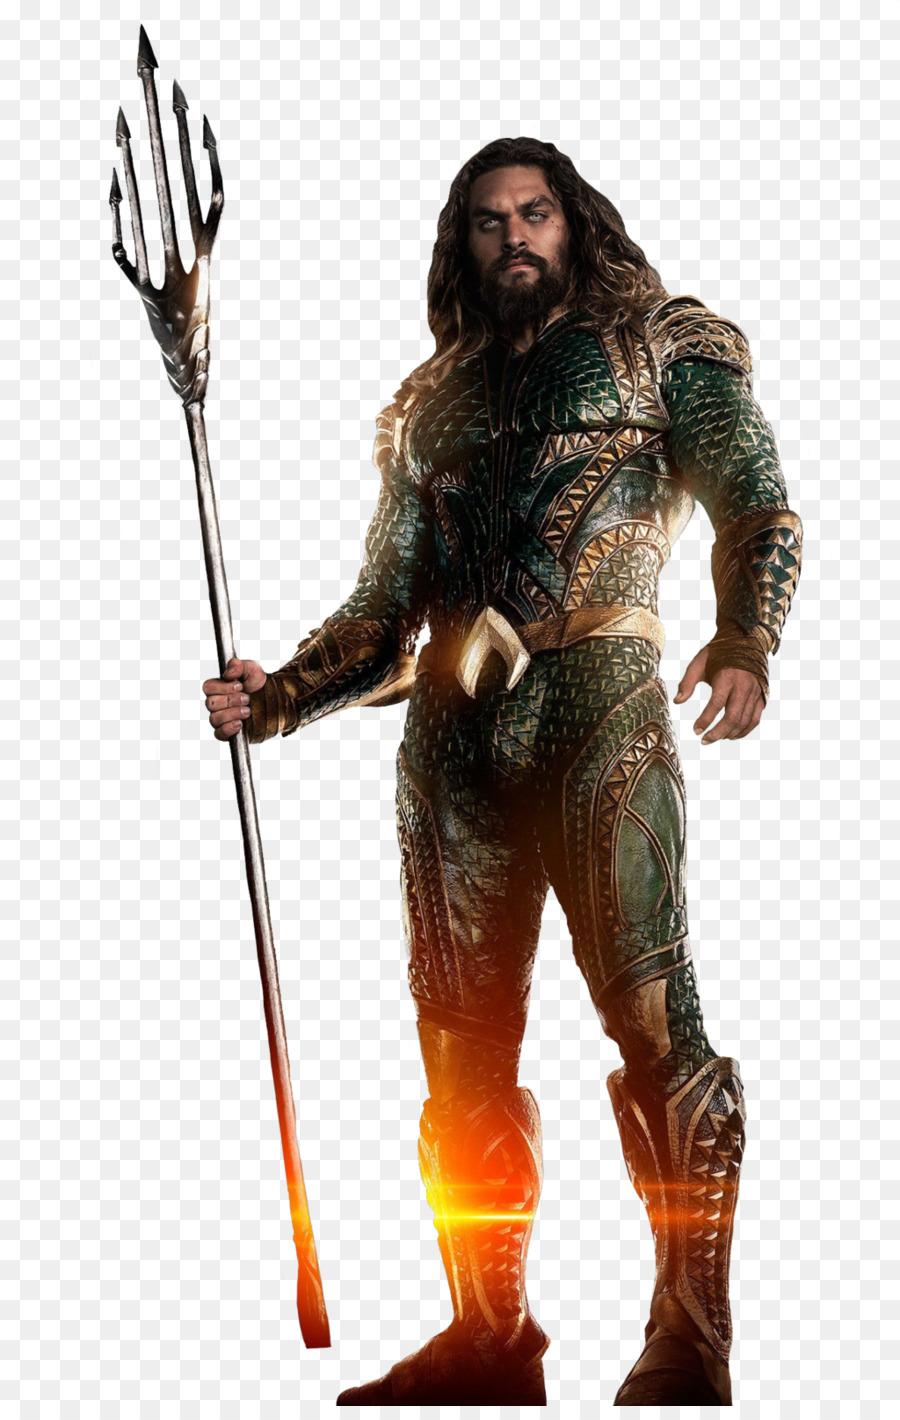 Aquaman Figurine png download.